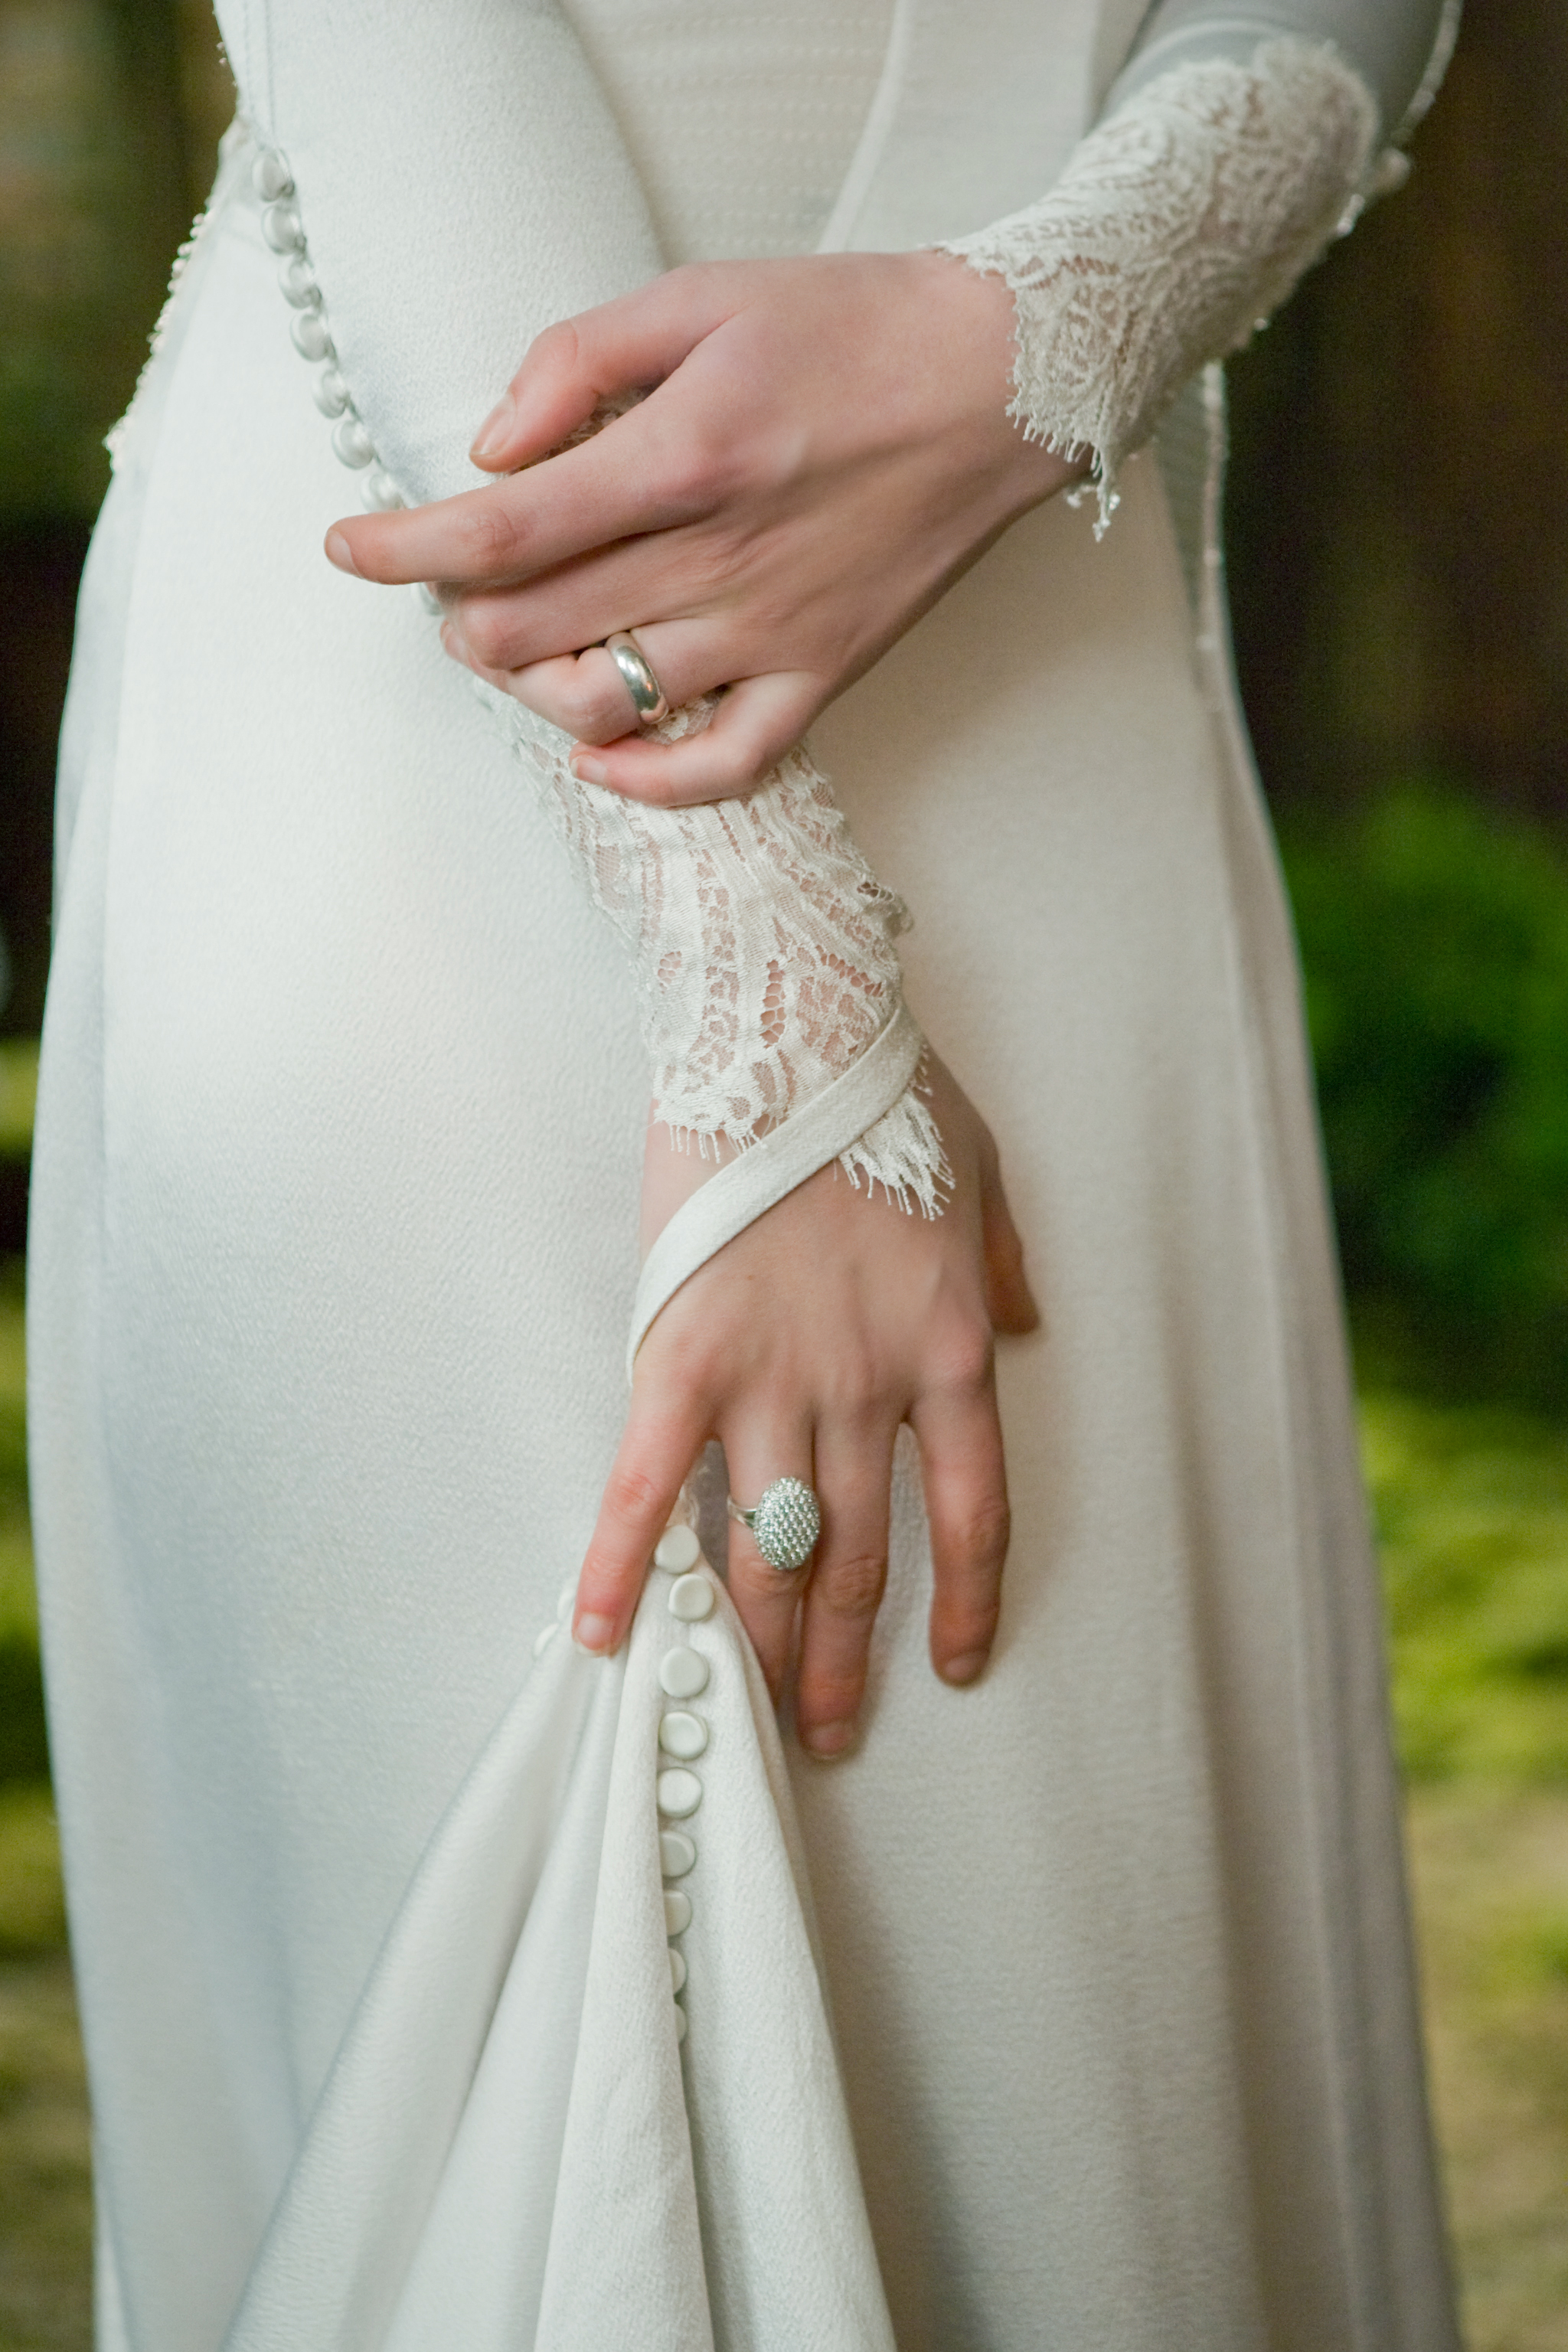 Twilight breaking dawn part 1 wedding dress images facts for Bella twilight wedding dress